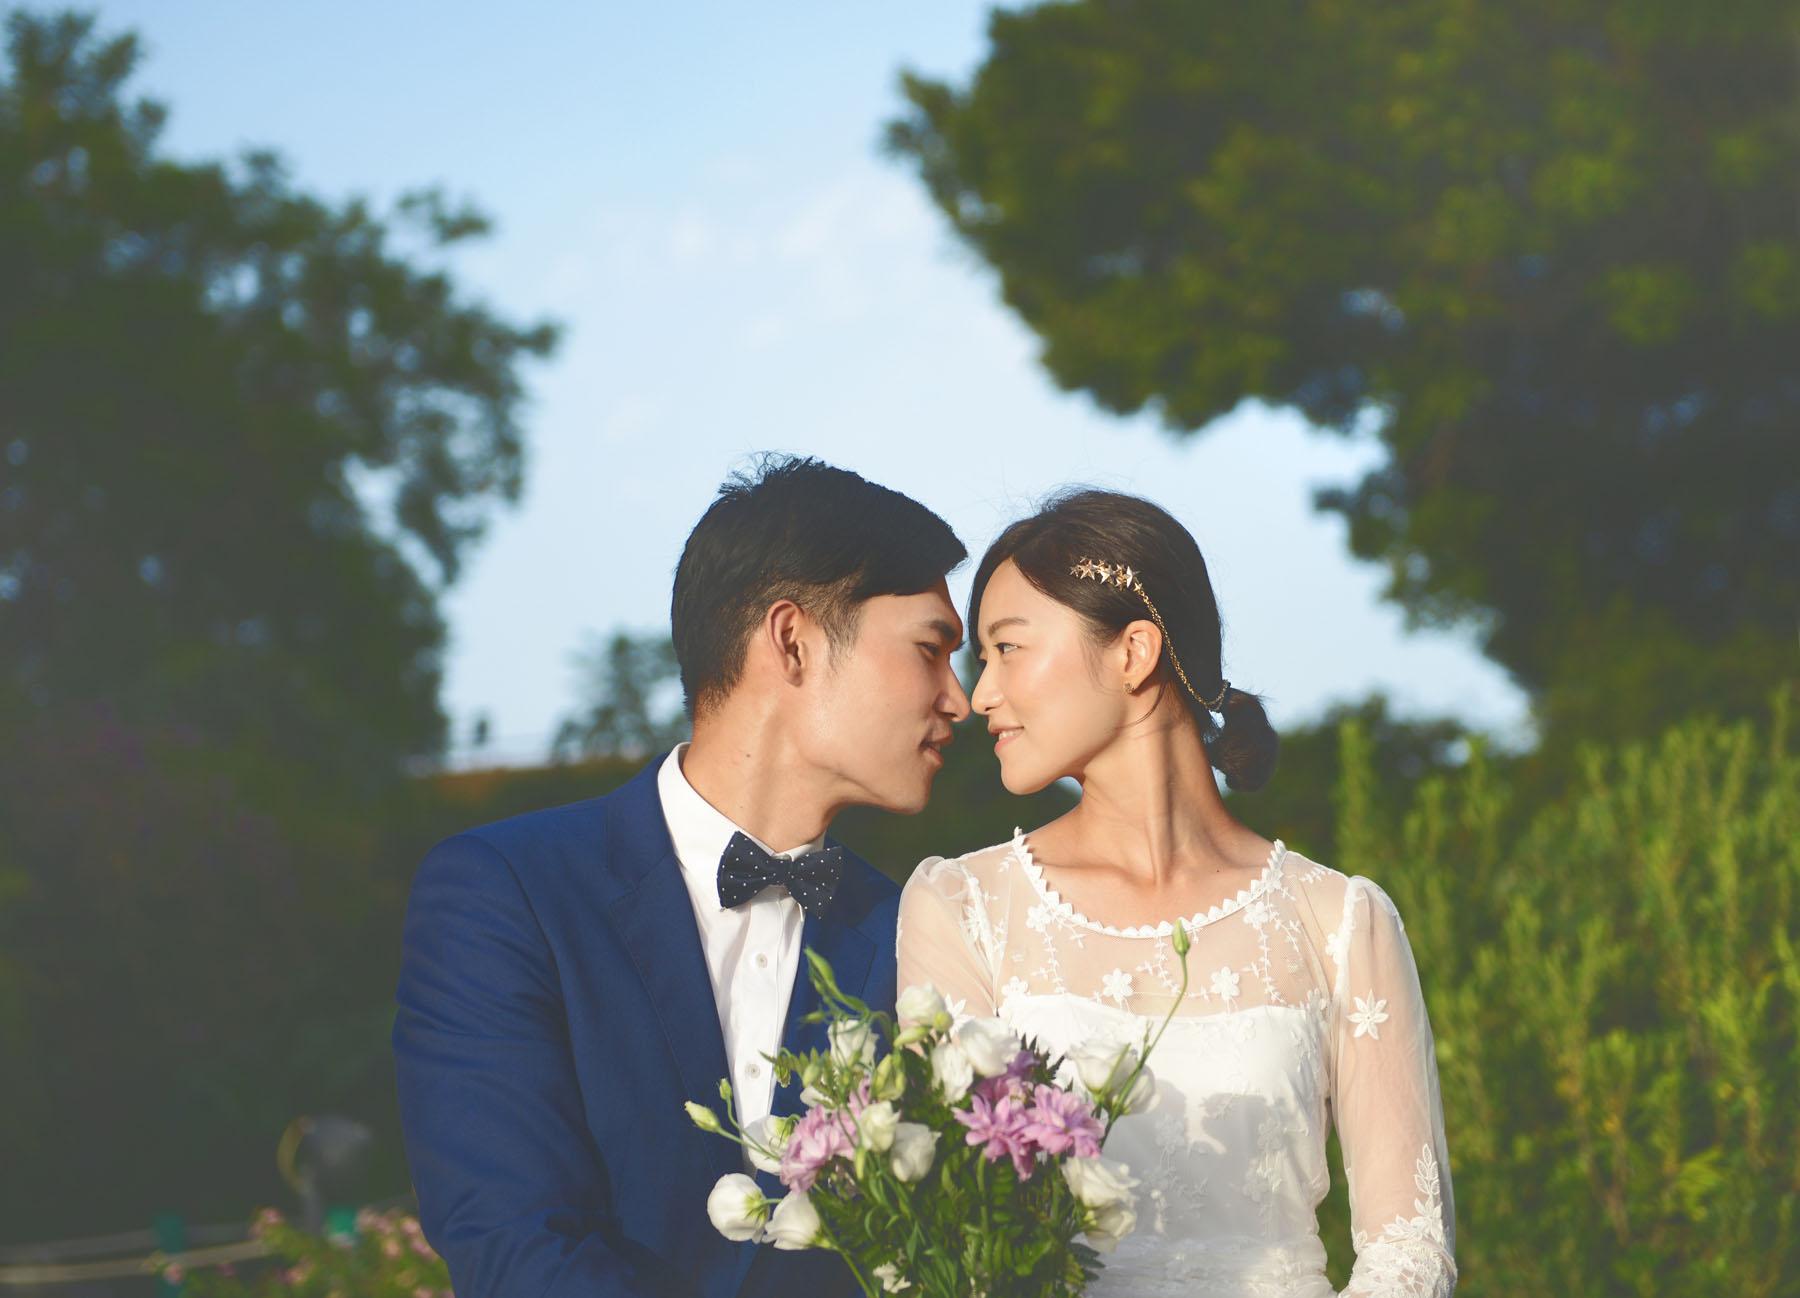 Japanese couples photos shoot